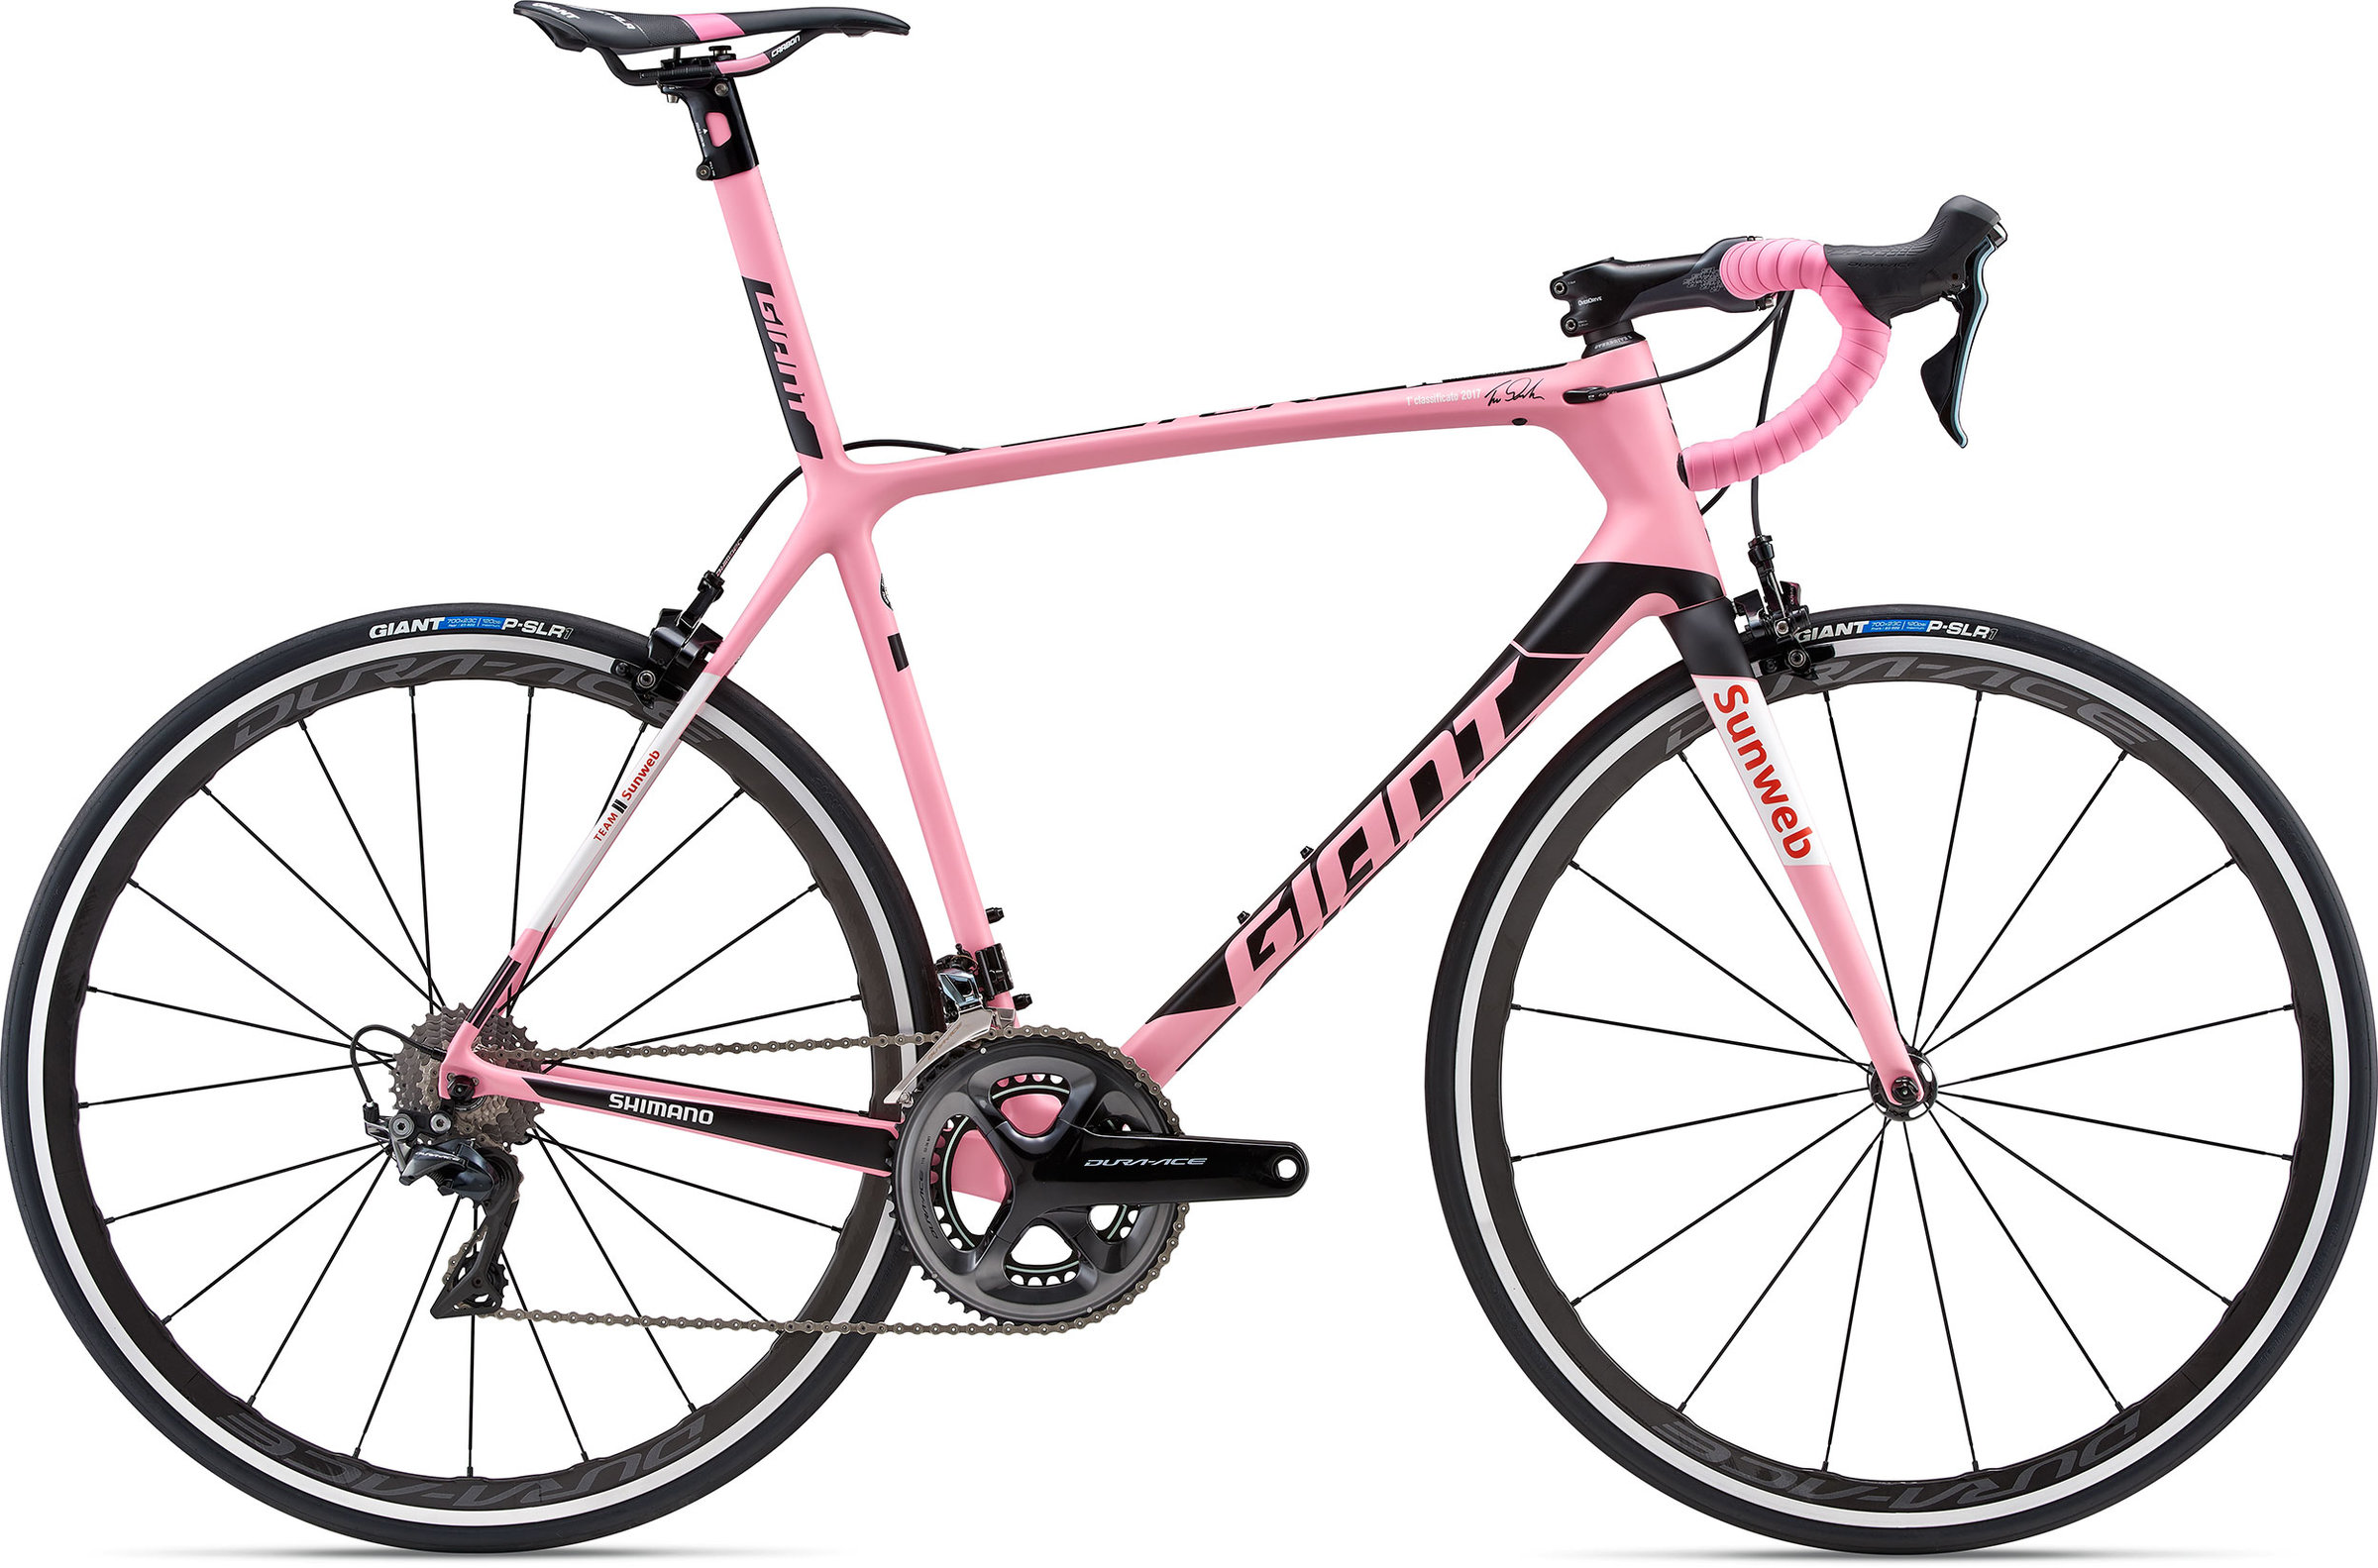 ad6caacf01b Giant TCR Advanced SL Maglia Rosa - Wheel World Bike Shops - Road ...